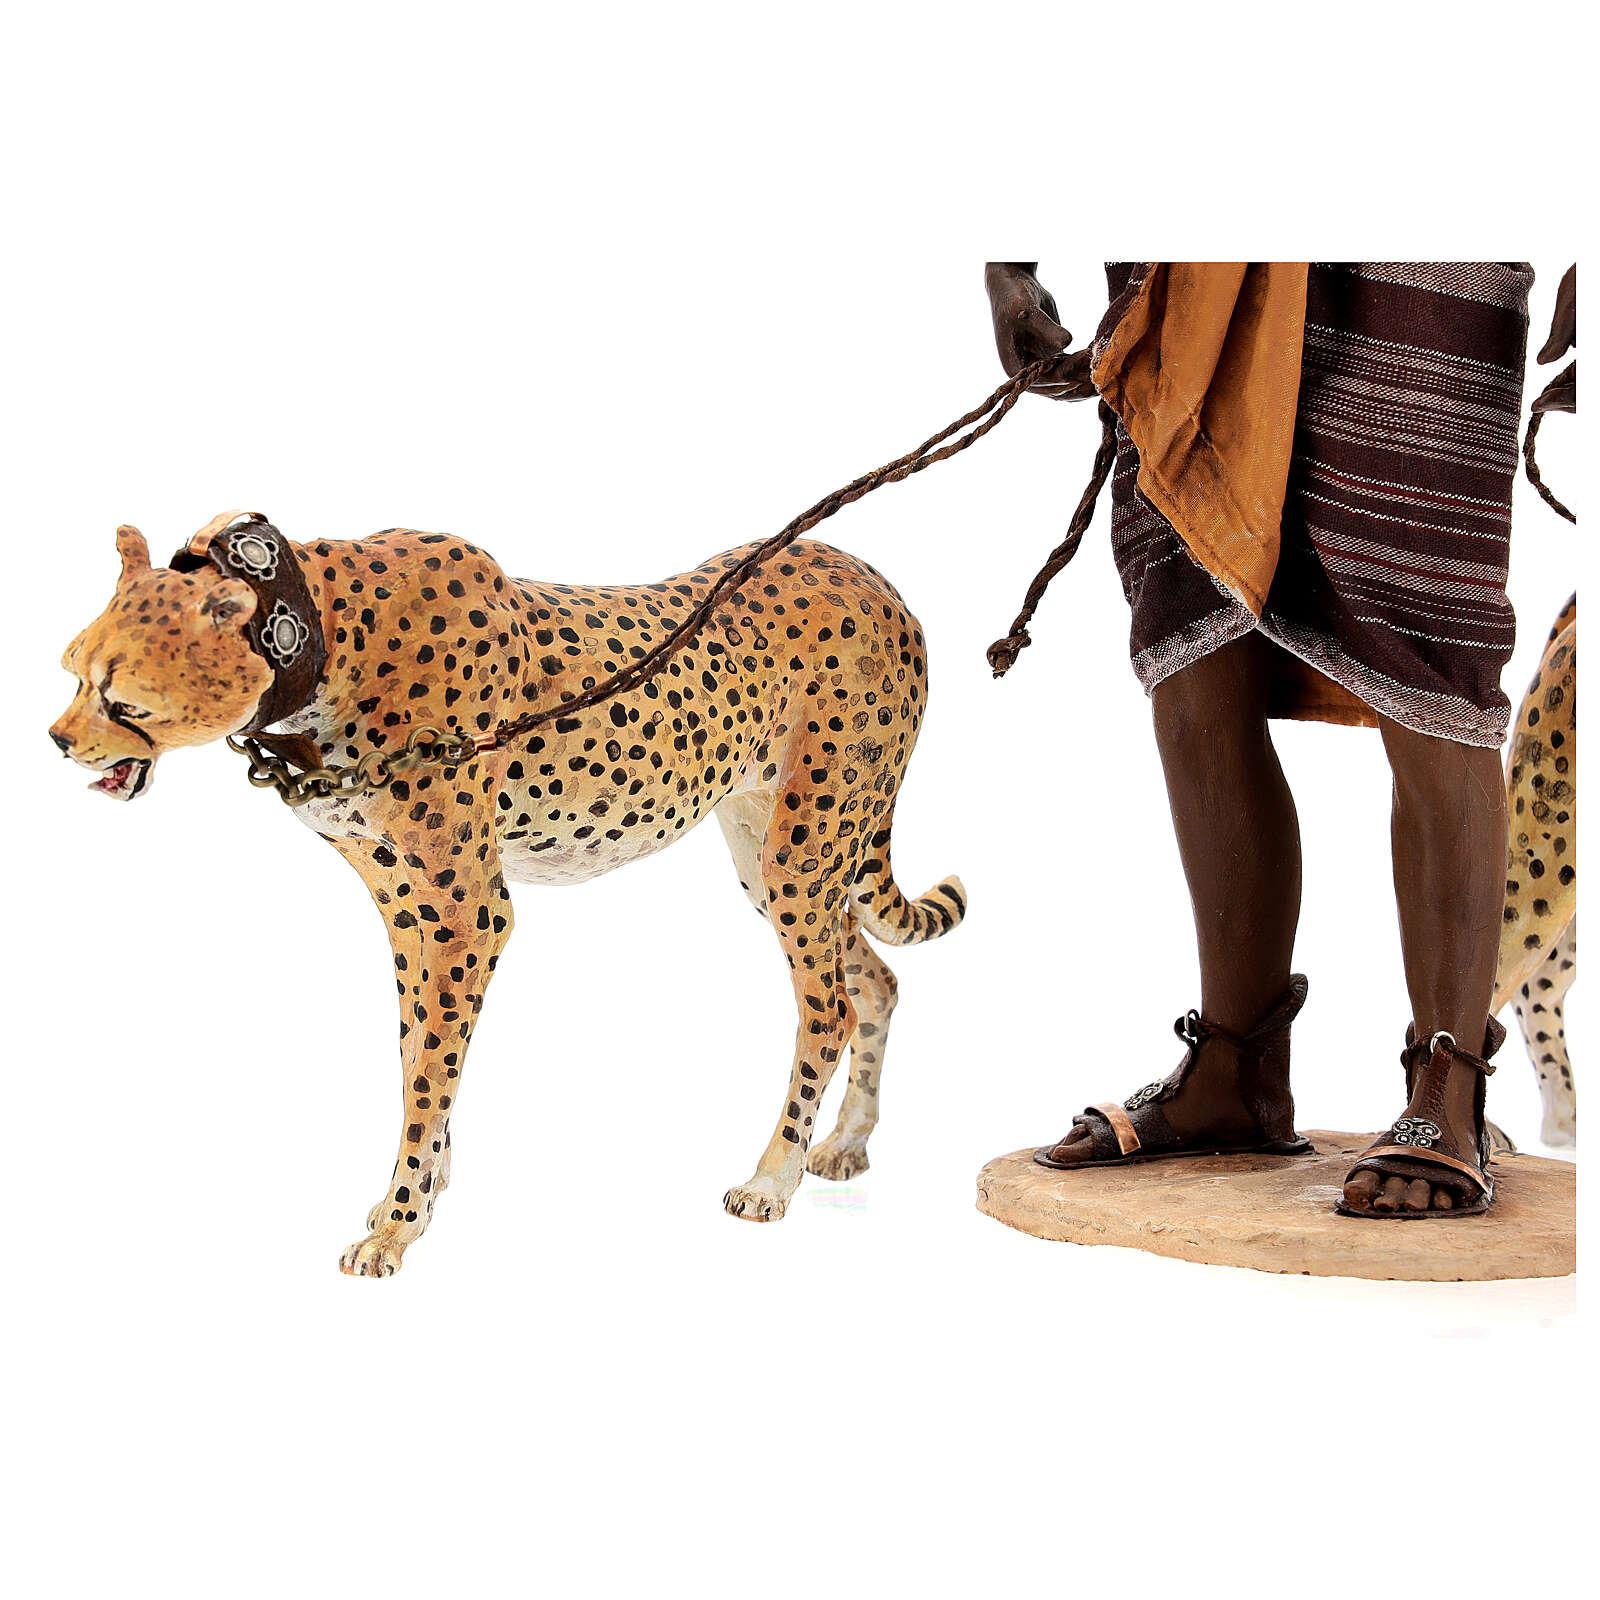 Slave with cheetahs, 30 cm Angela Tripi 4